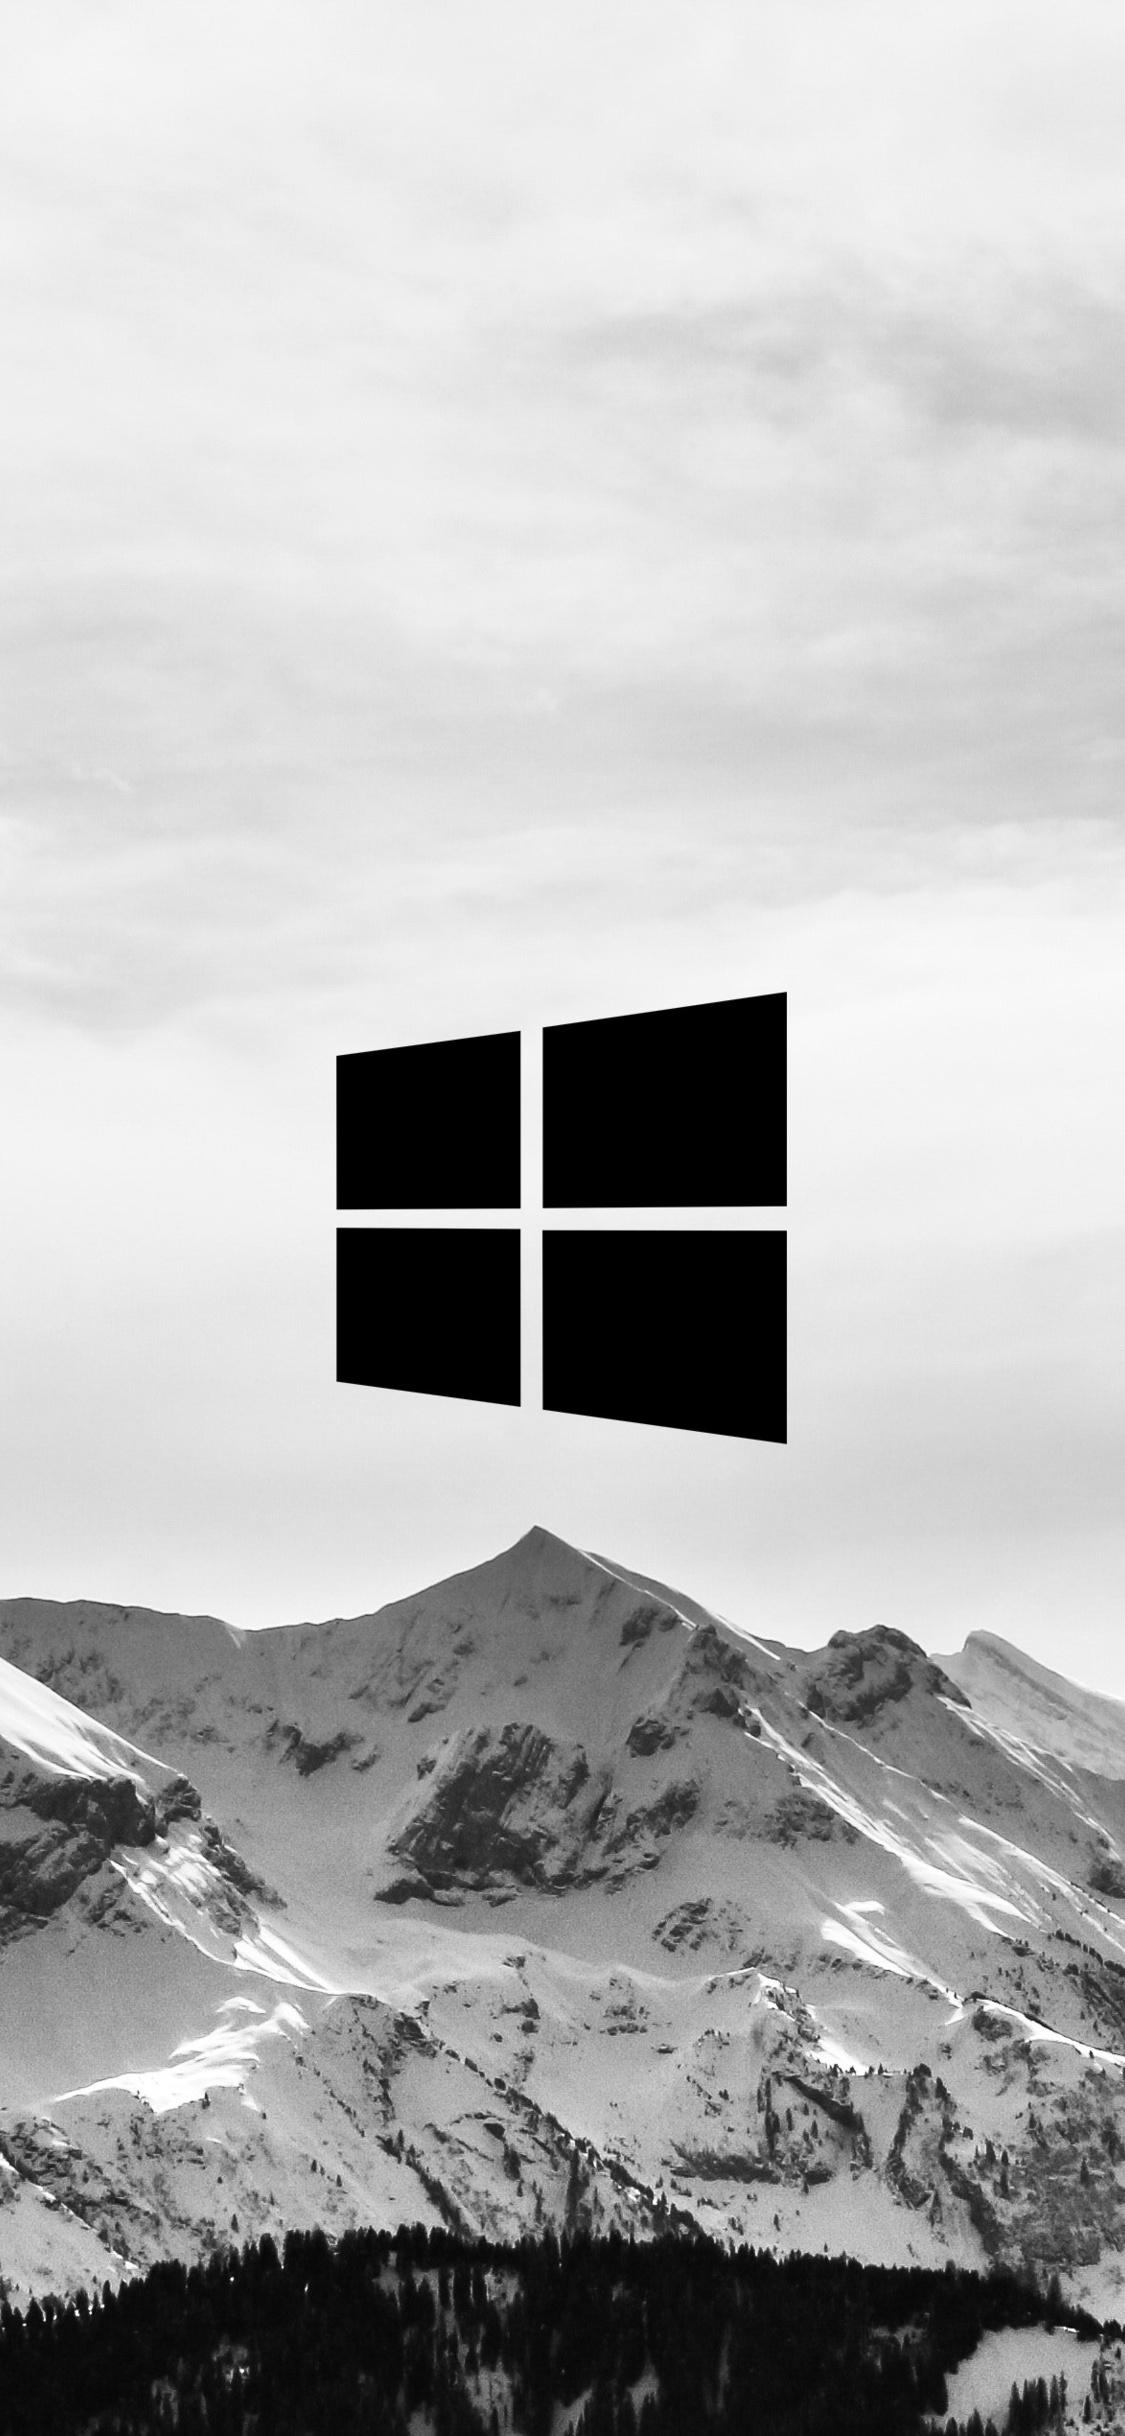 snow-mountains-windows-logo-5k-8l.jpg